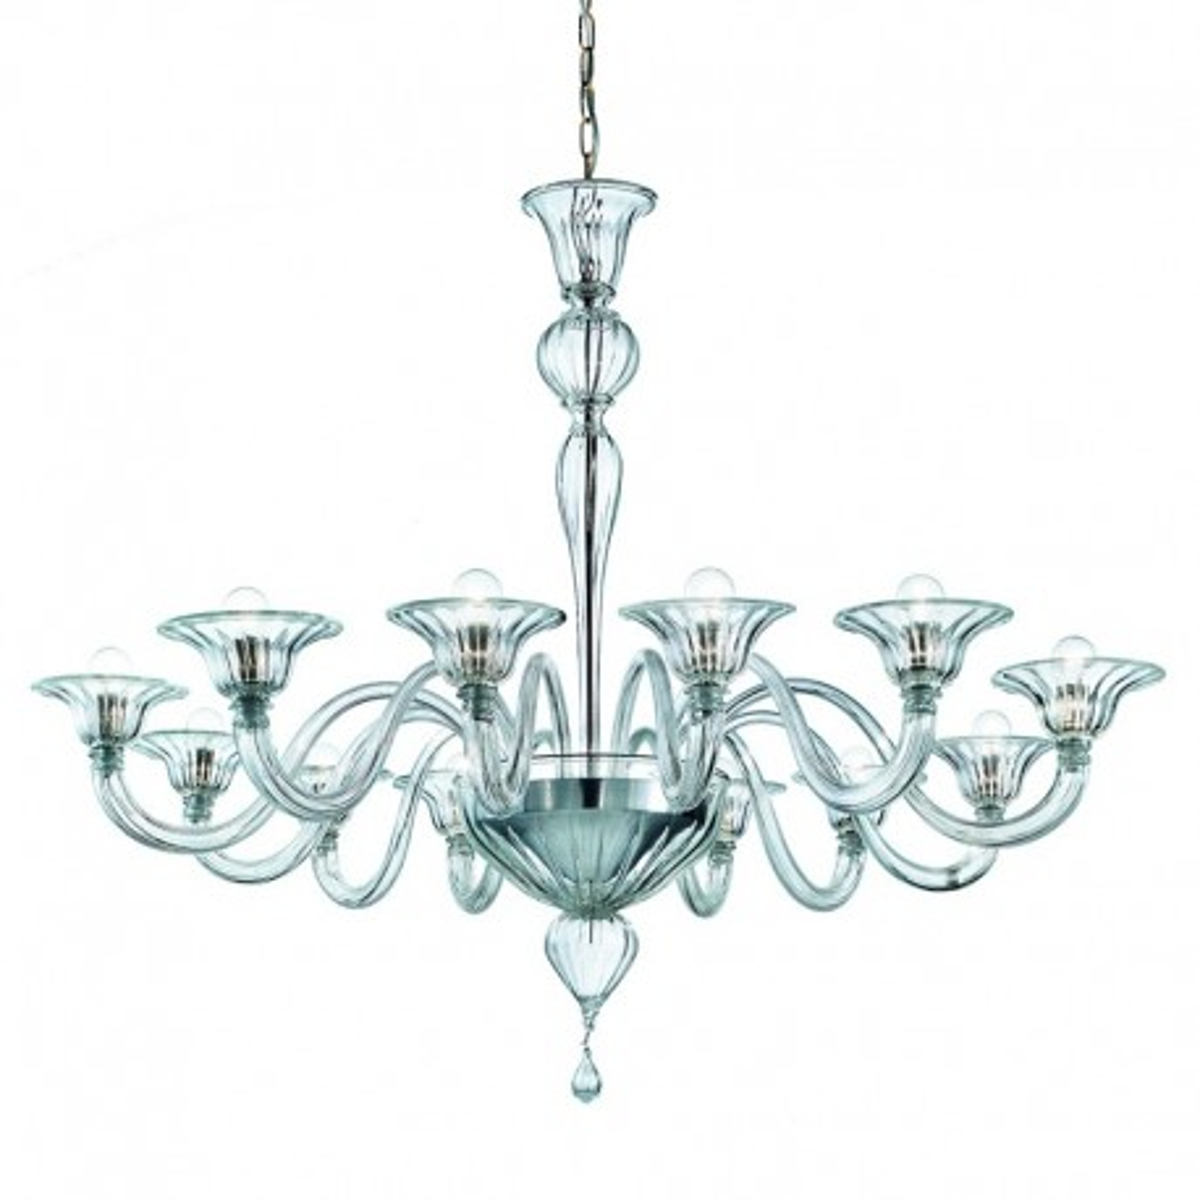 Doge 12 luces lámpara de Murano - color transparente